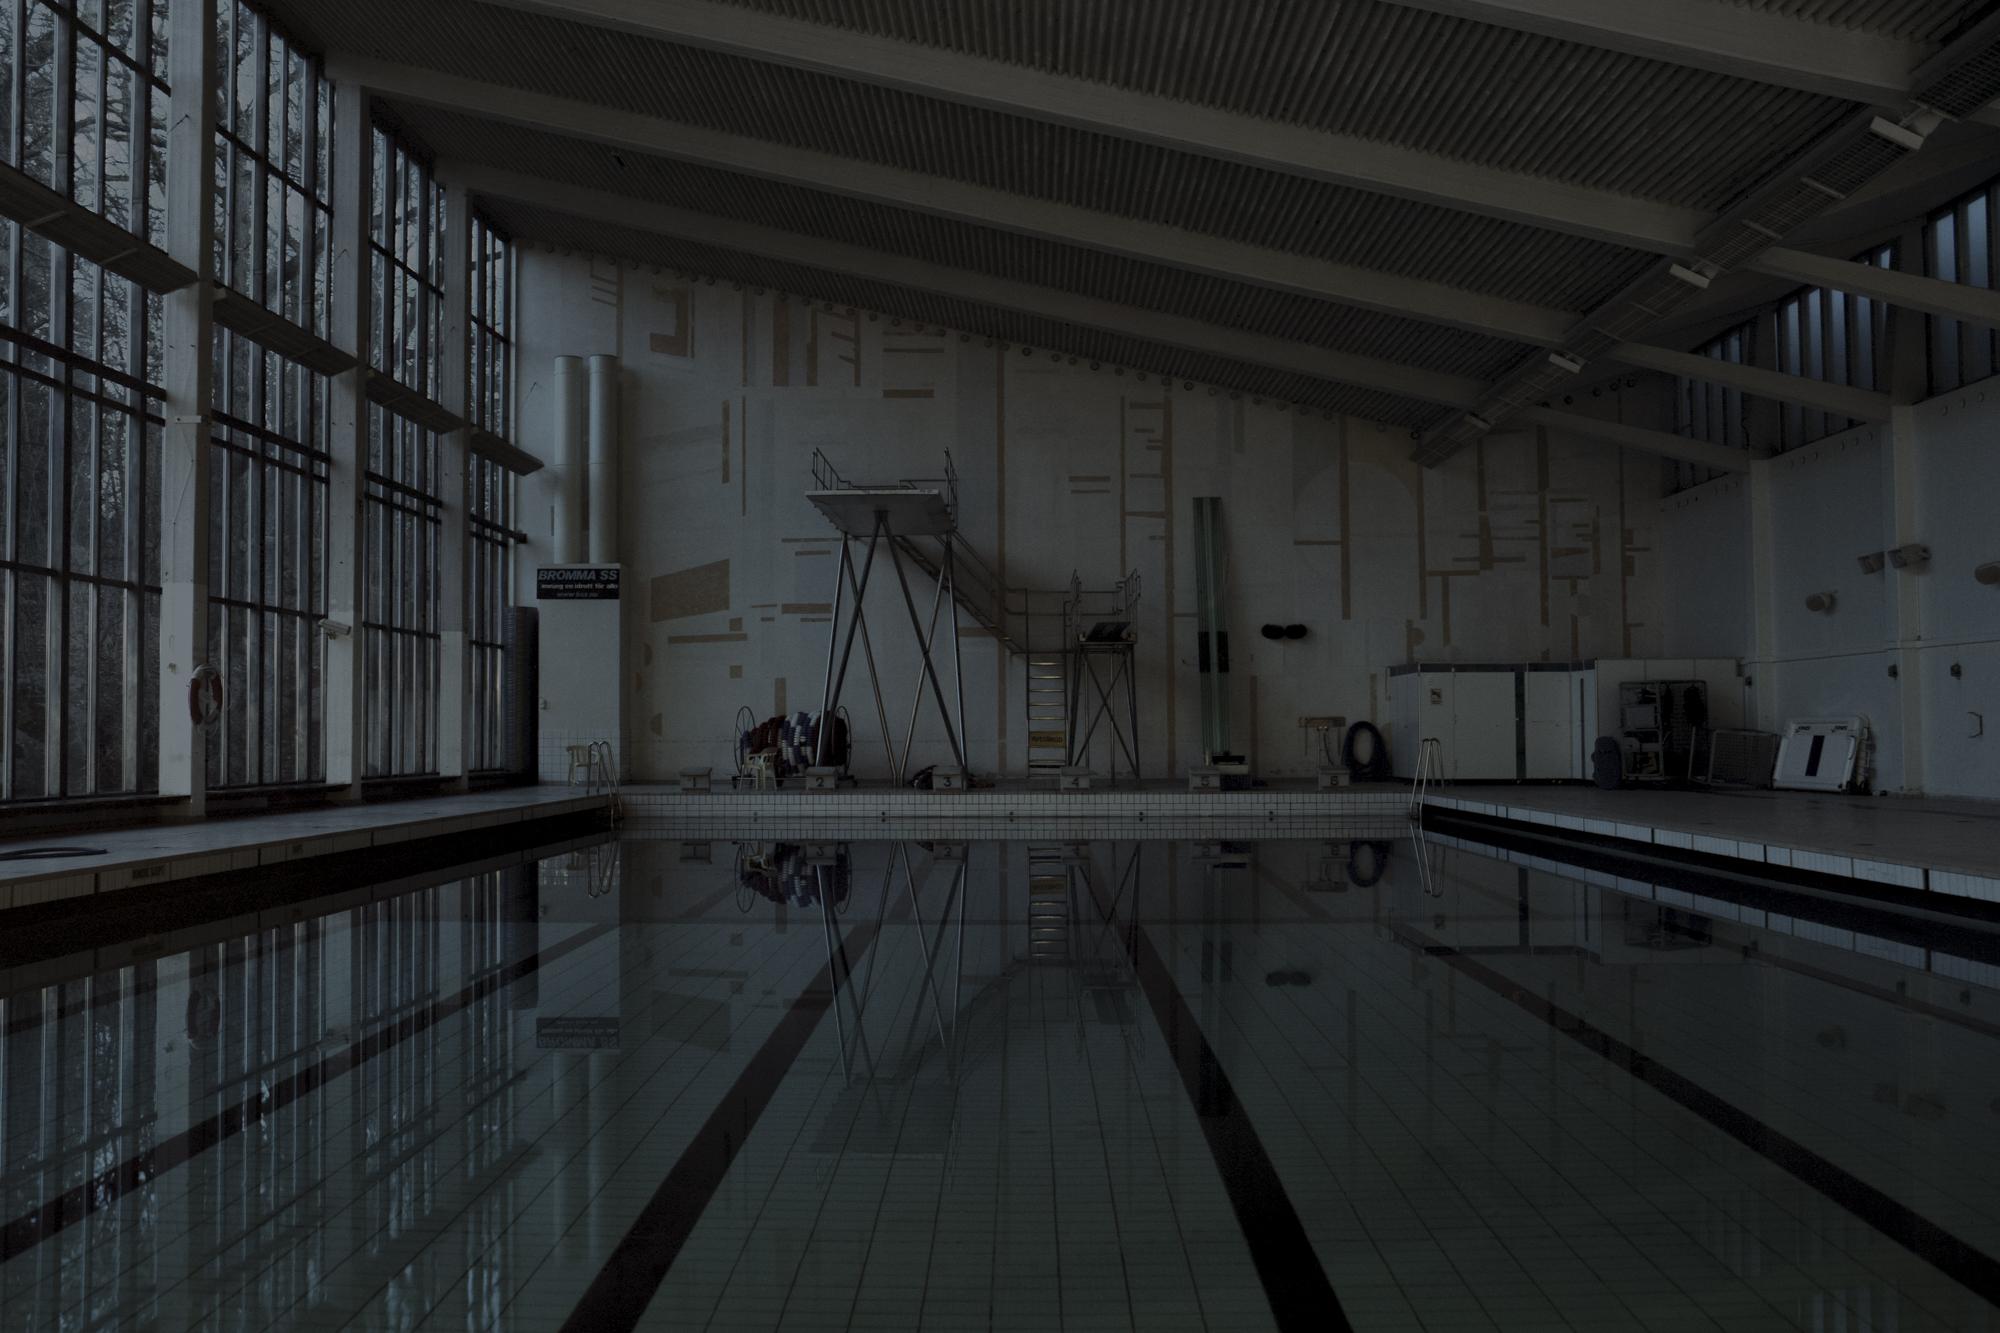 4. Alison De Mars. Sink/Swim, 2015. Utropspris: 4 000:-Bildmått: 60×40 cm / Inramad 63×43 cm. C-print. Edition 2/12. Signerad.